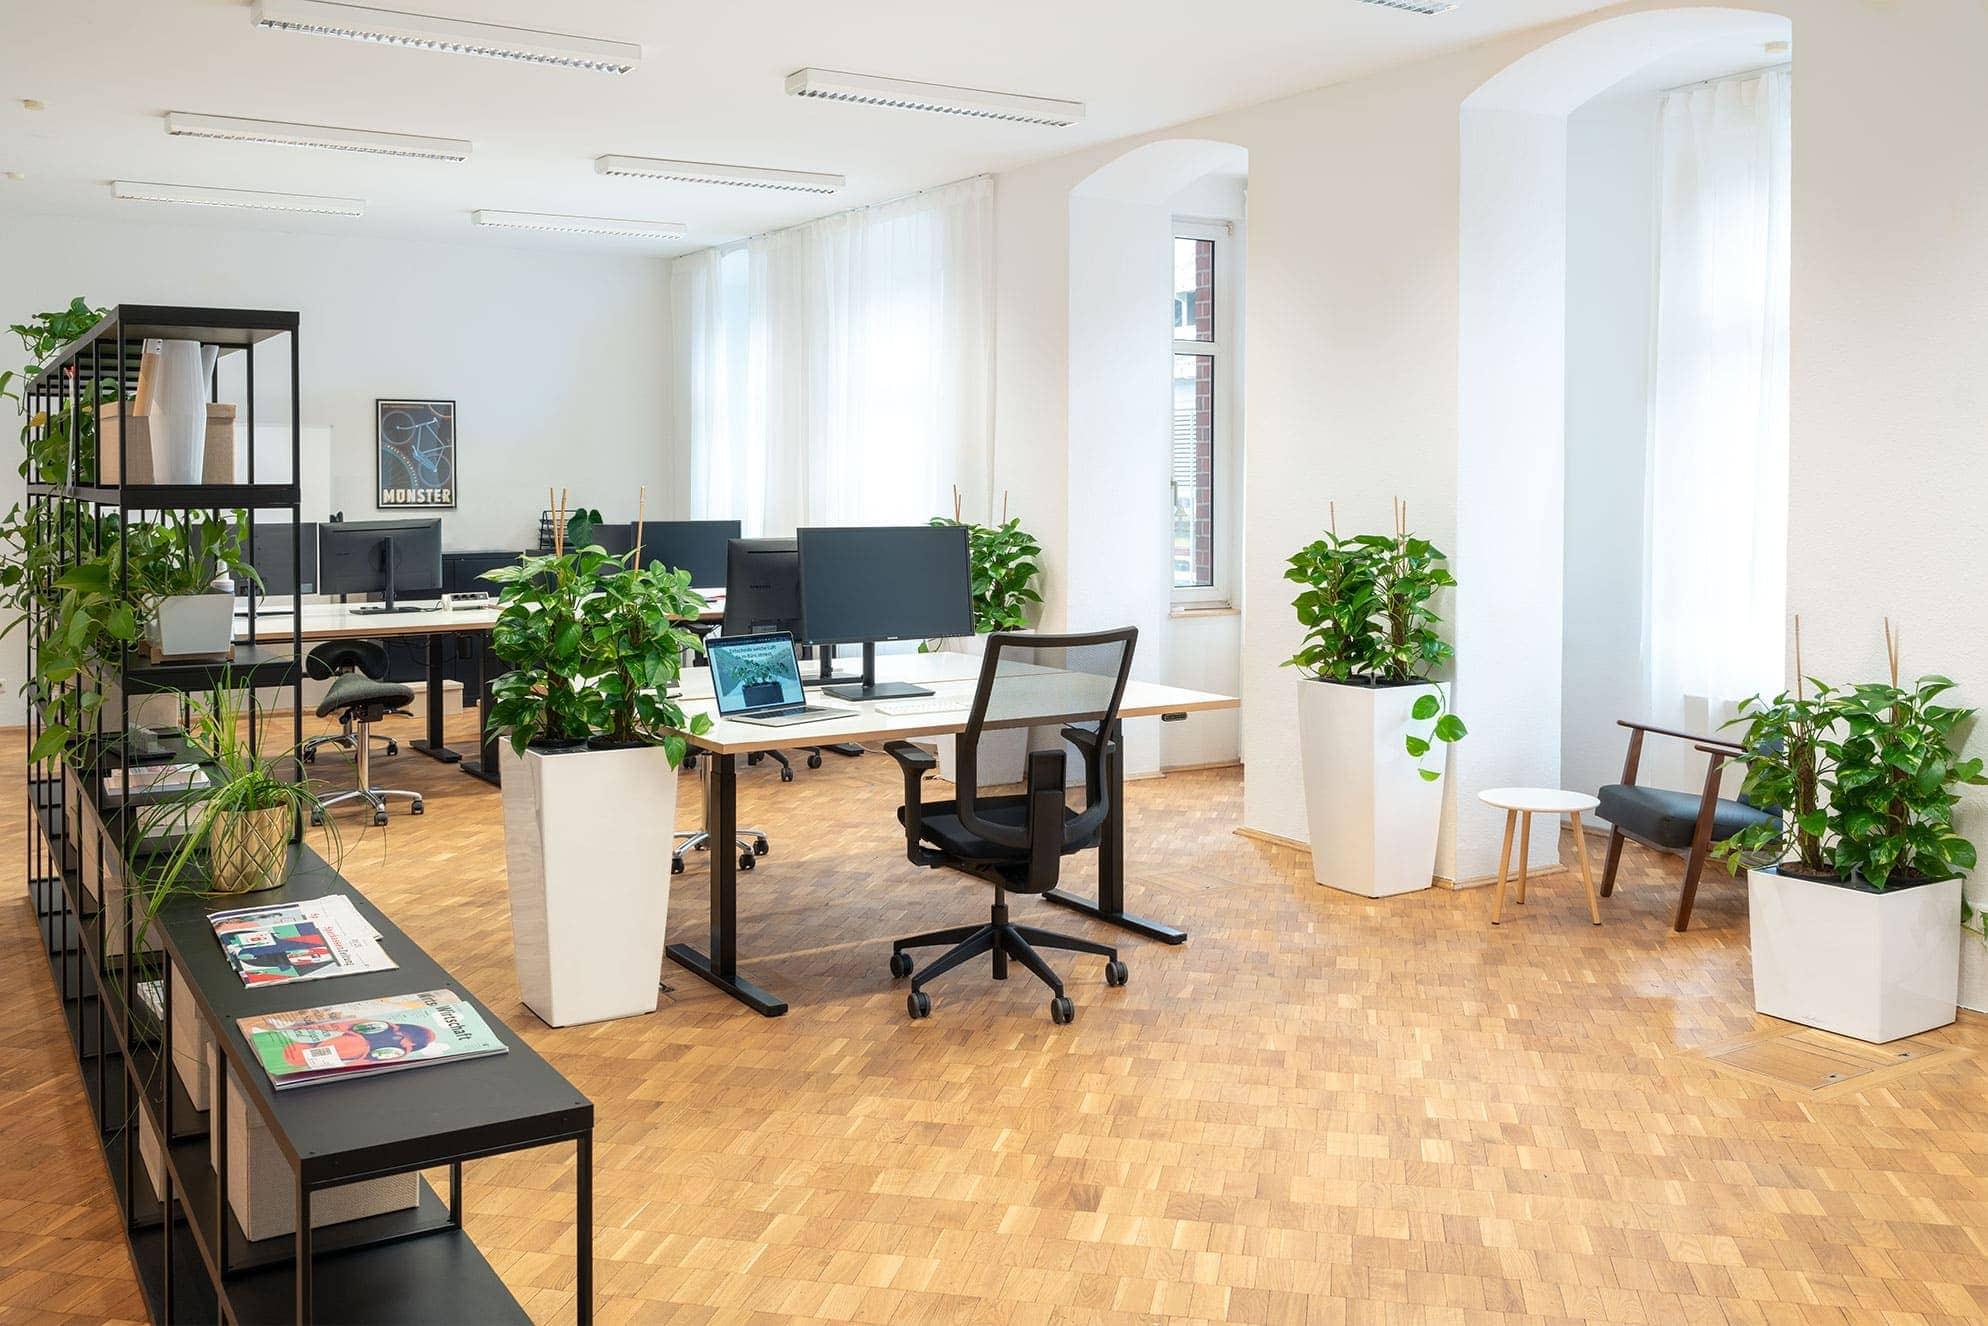 Florafilt@Ideenfabrik